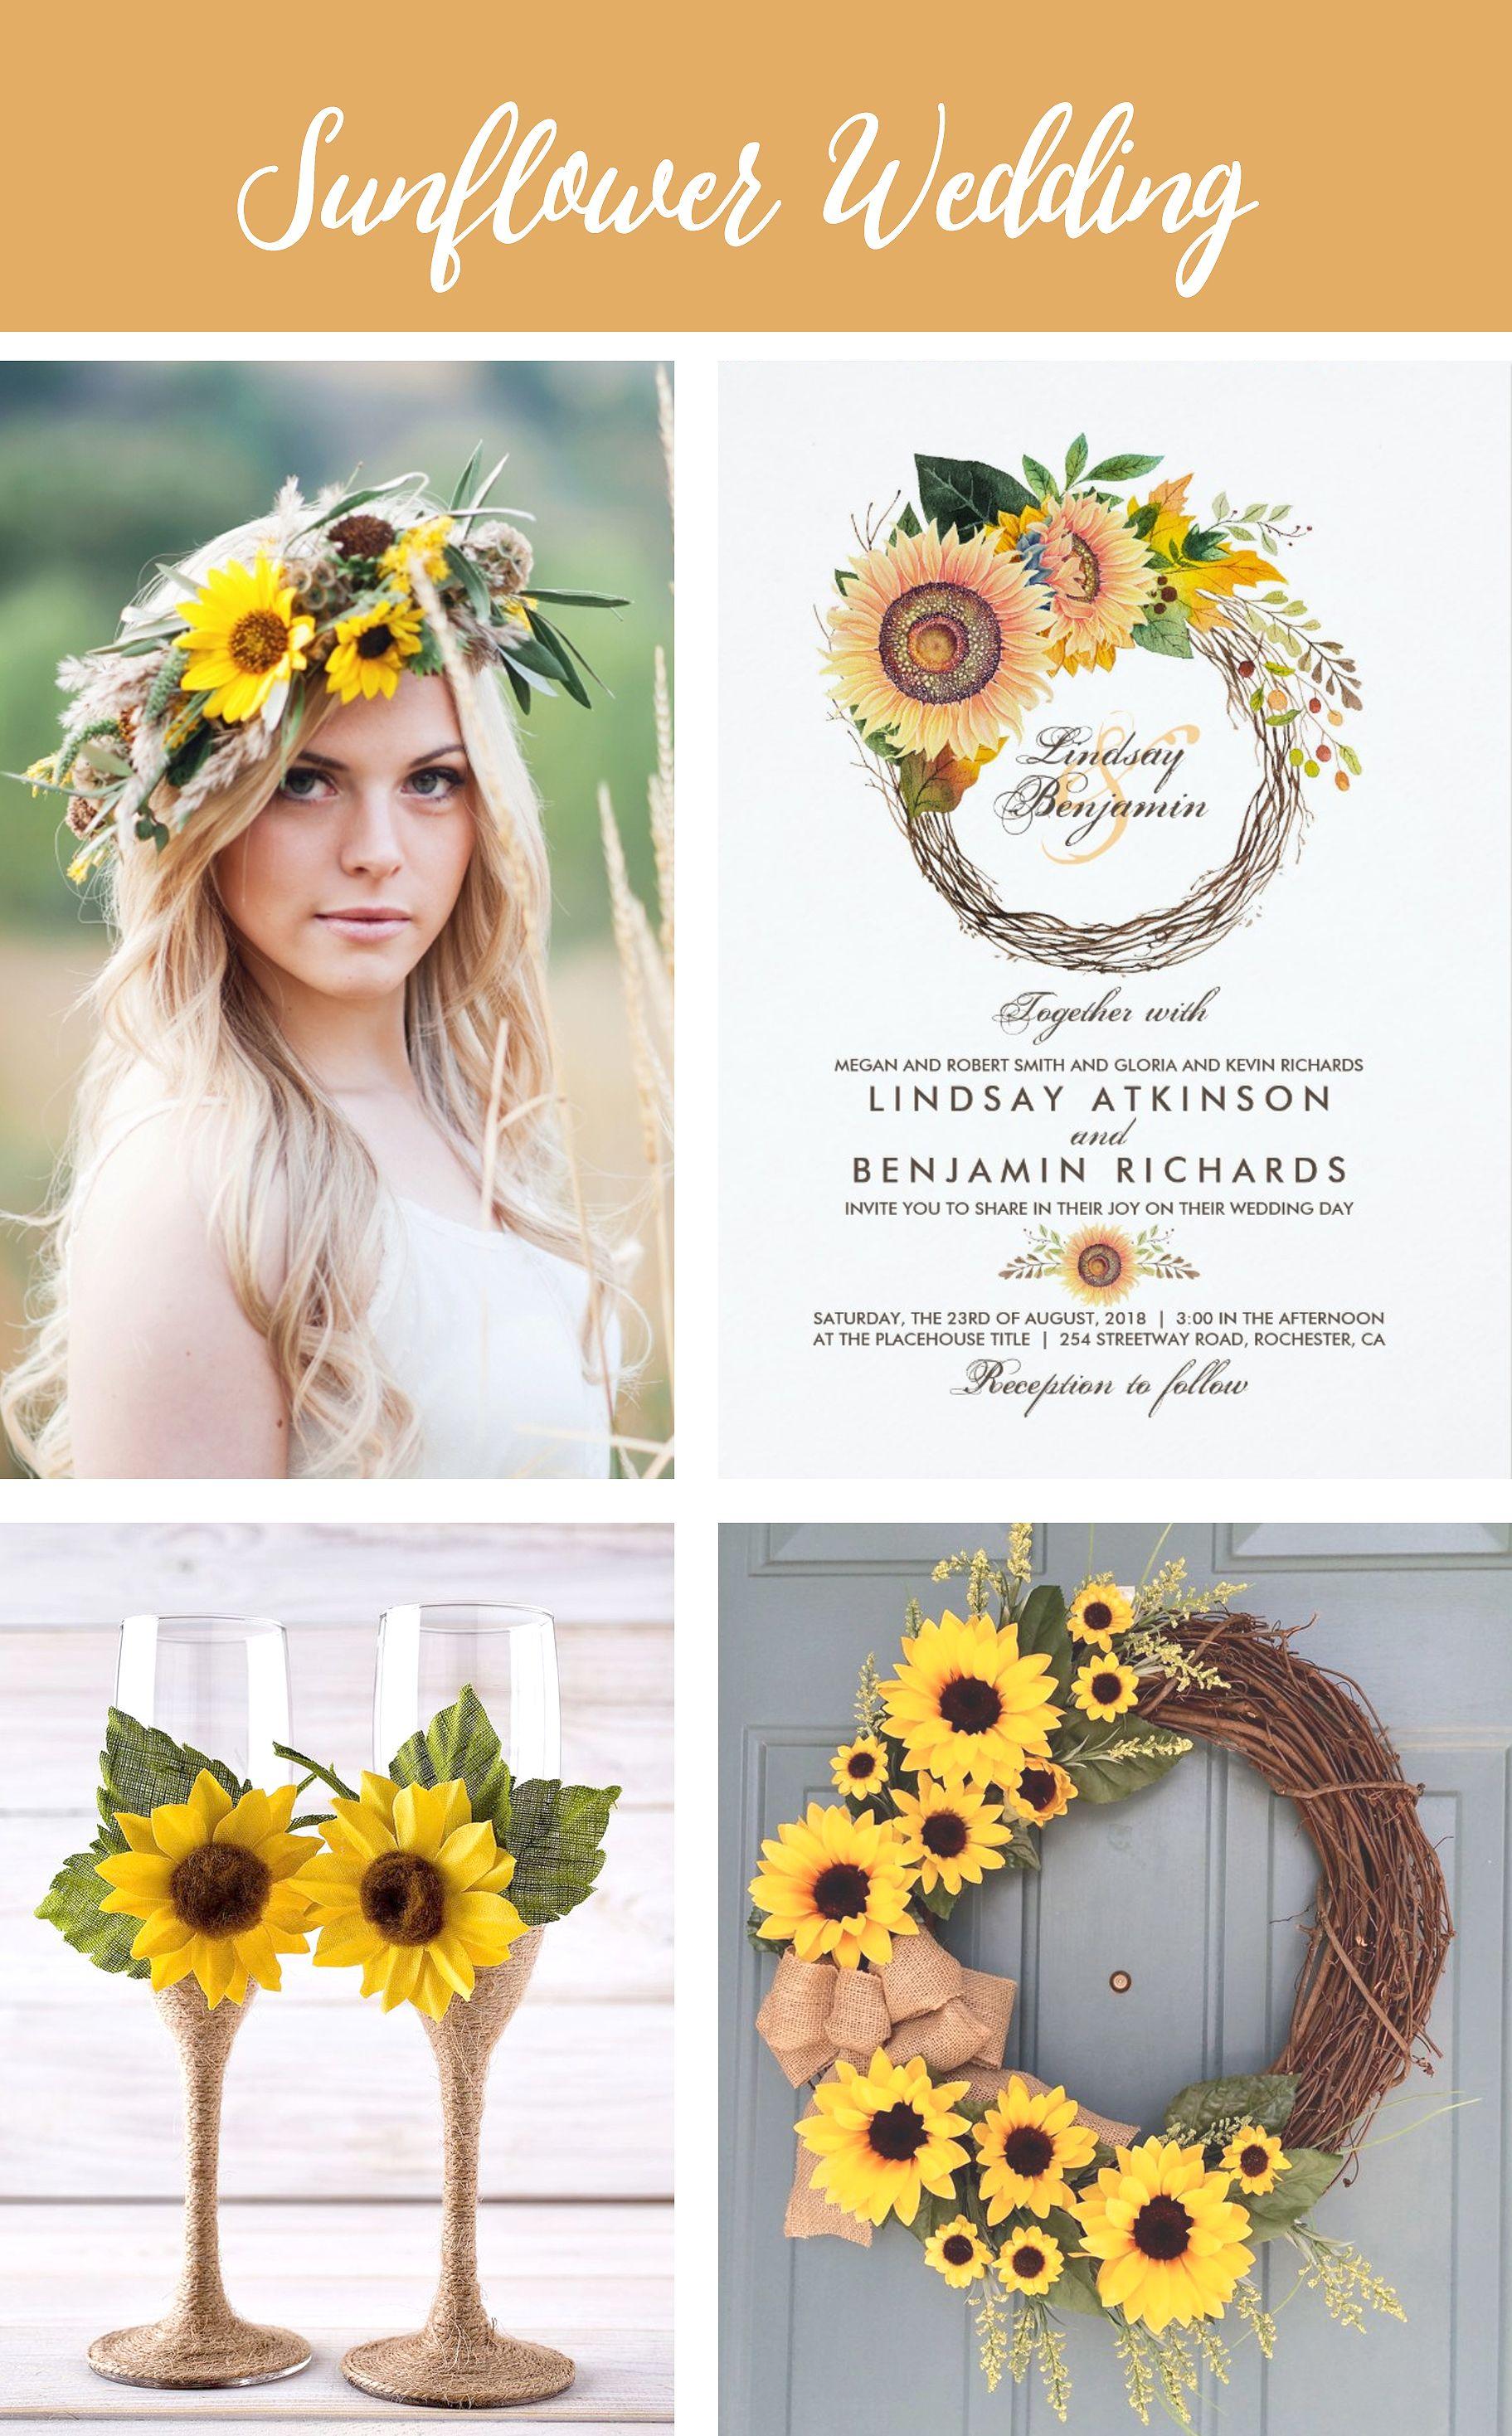 Sunflowers Wreath Rustic Fall Wedding Invitation | Pinterest ...